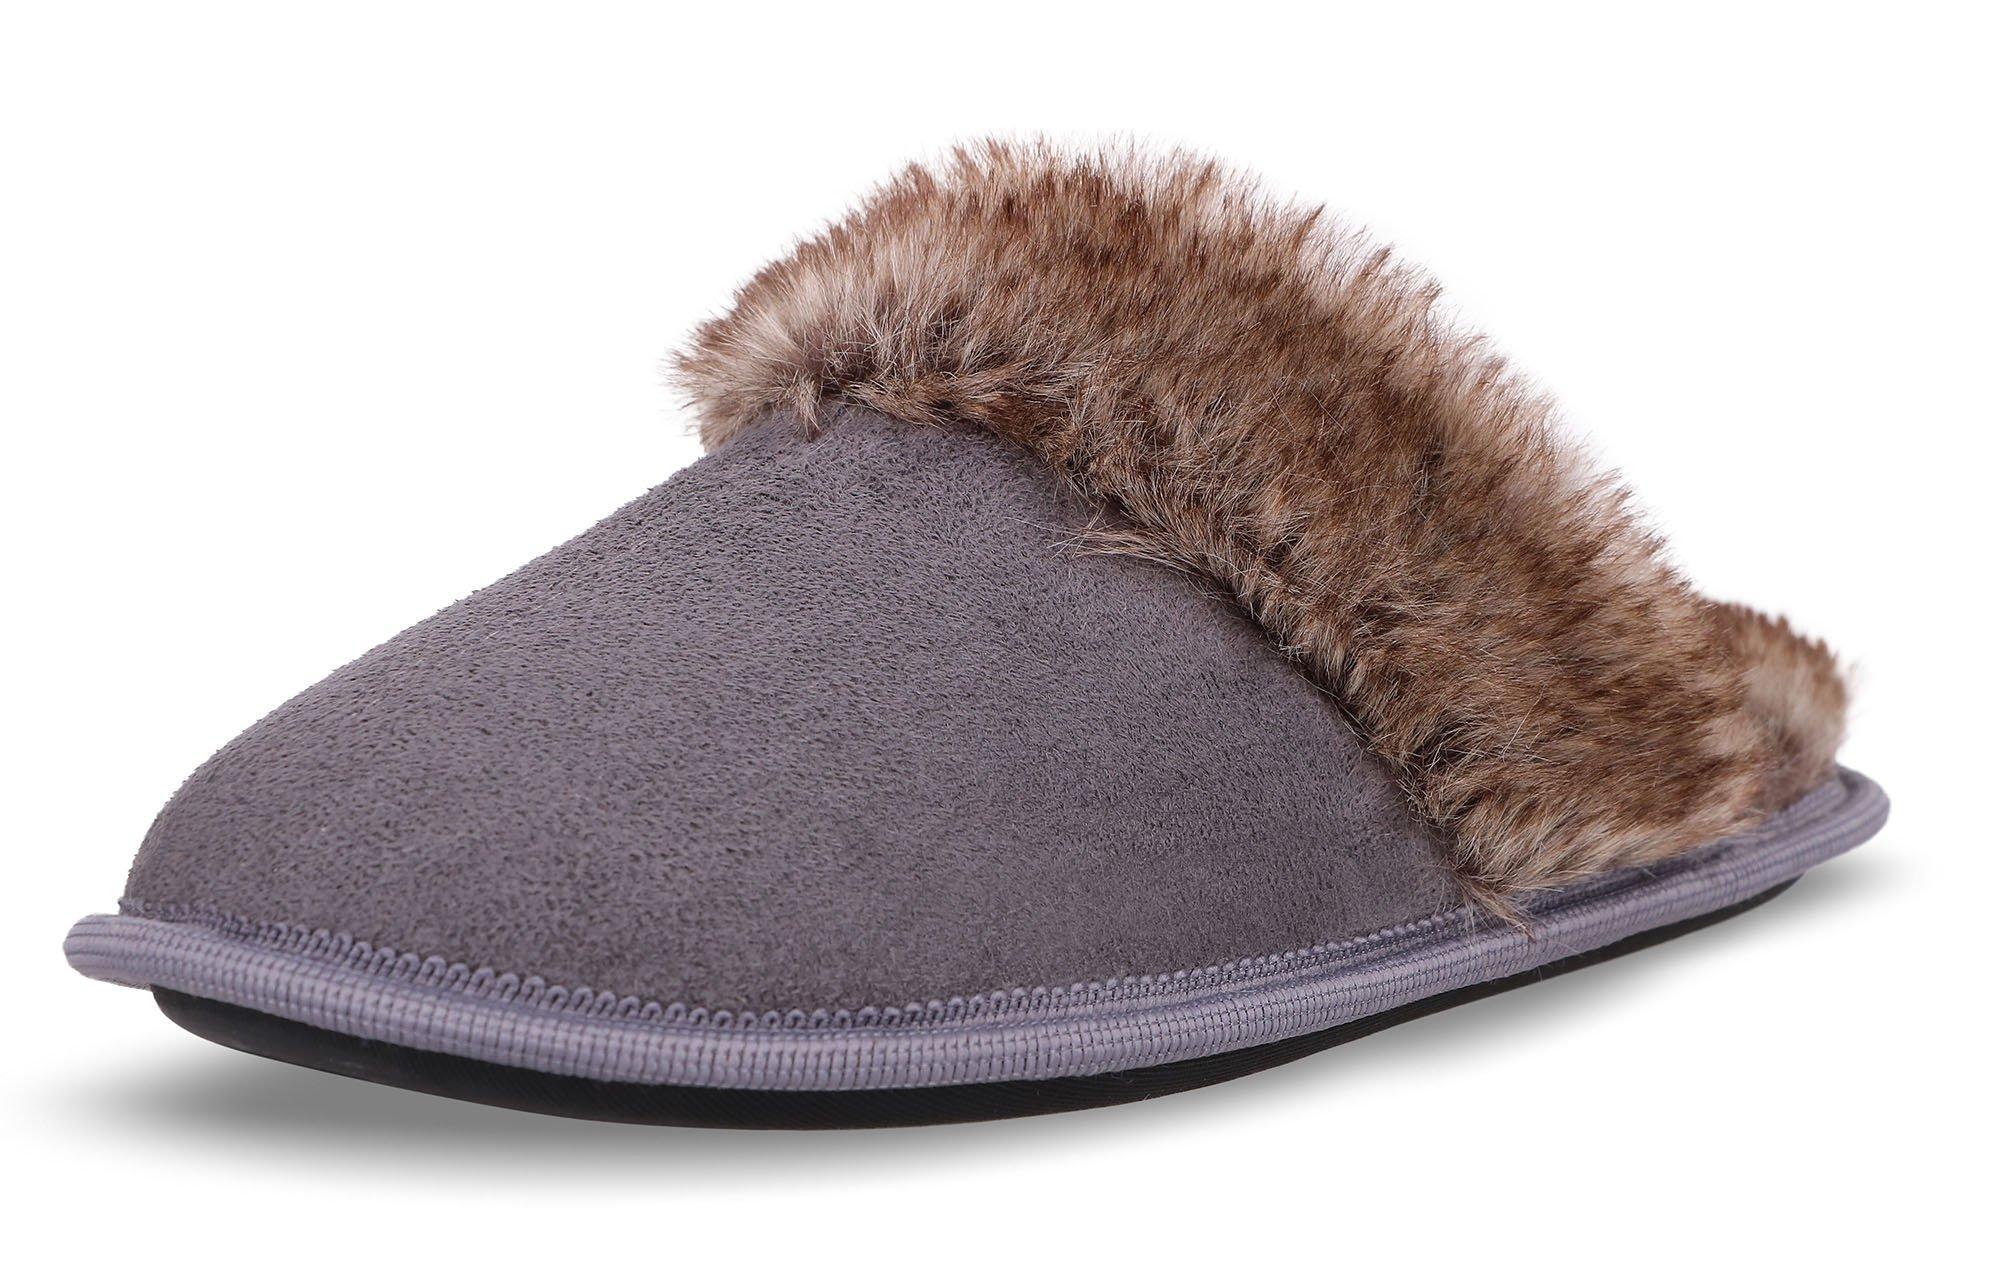 Arctic Paw Plush Rubber-Soled Faux Suede Fur Women Slippers, Grey M/L(8-9)